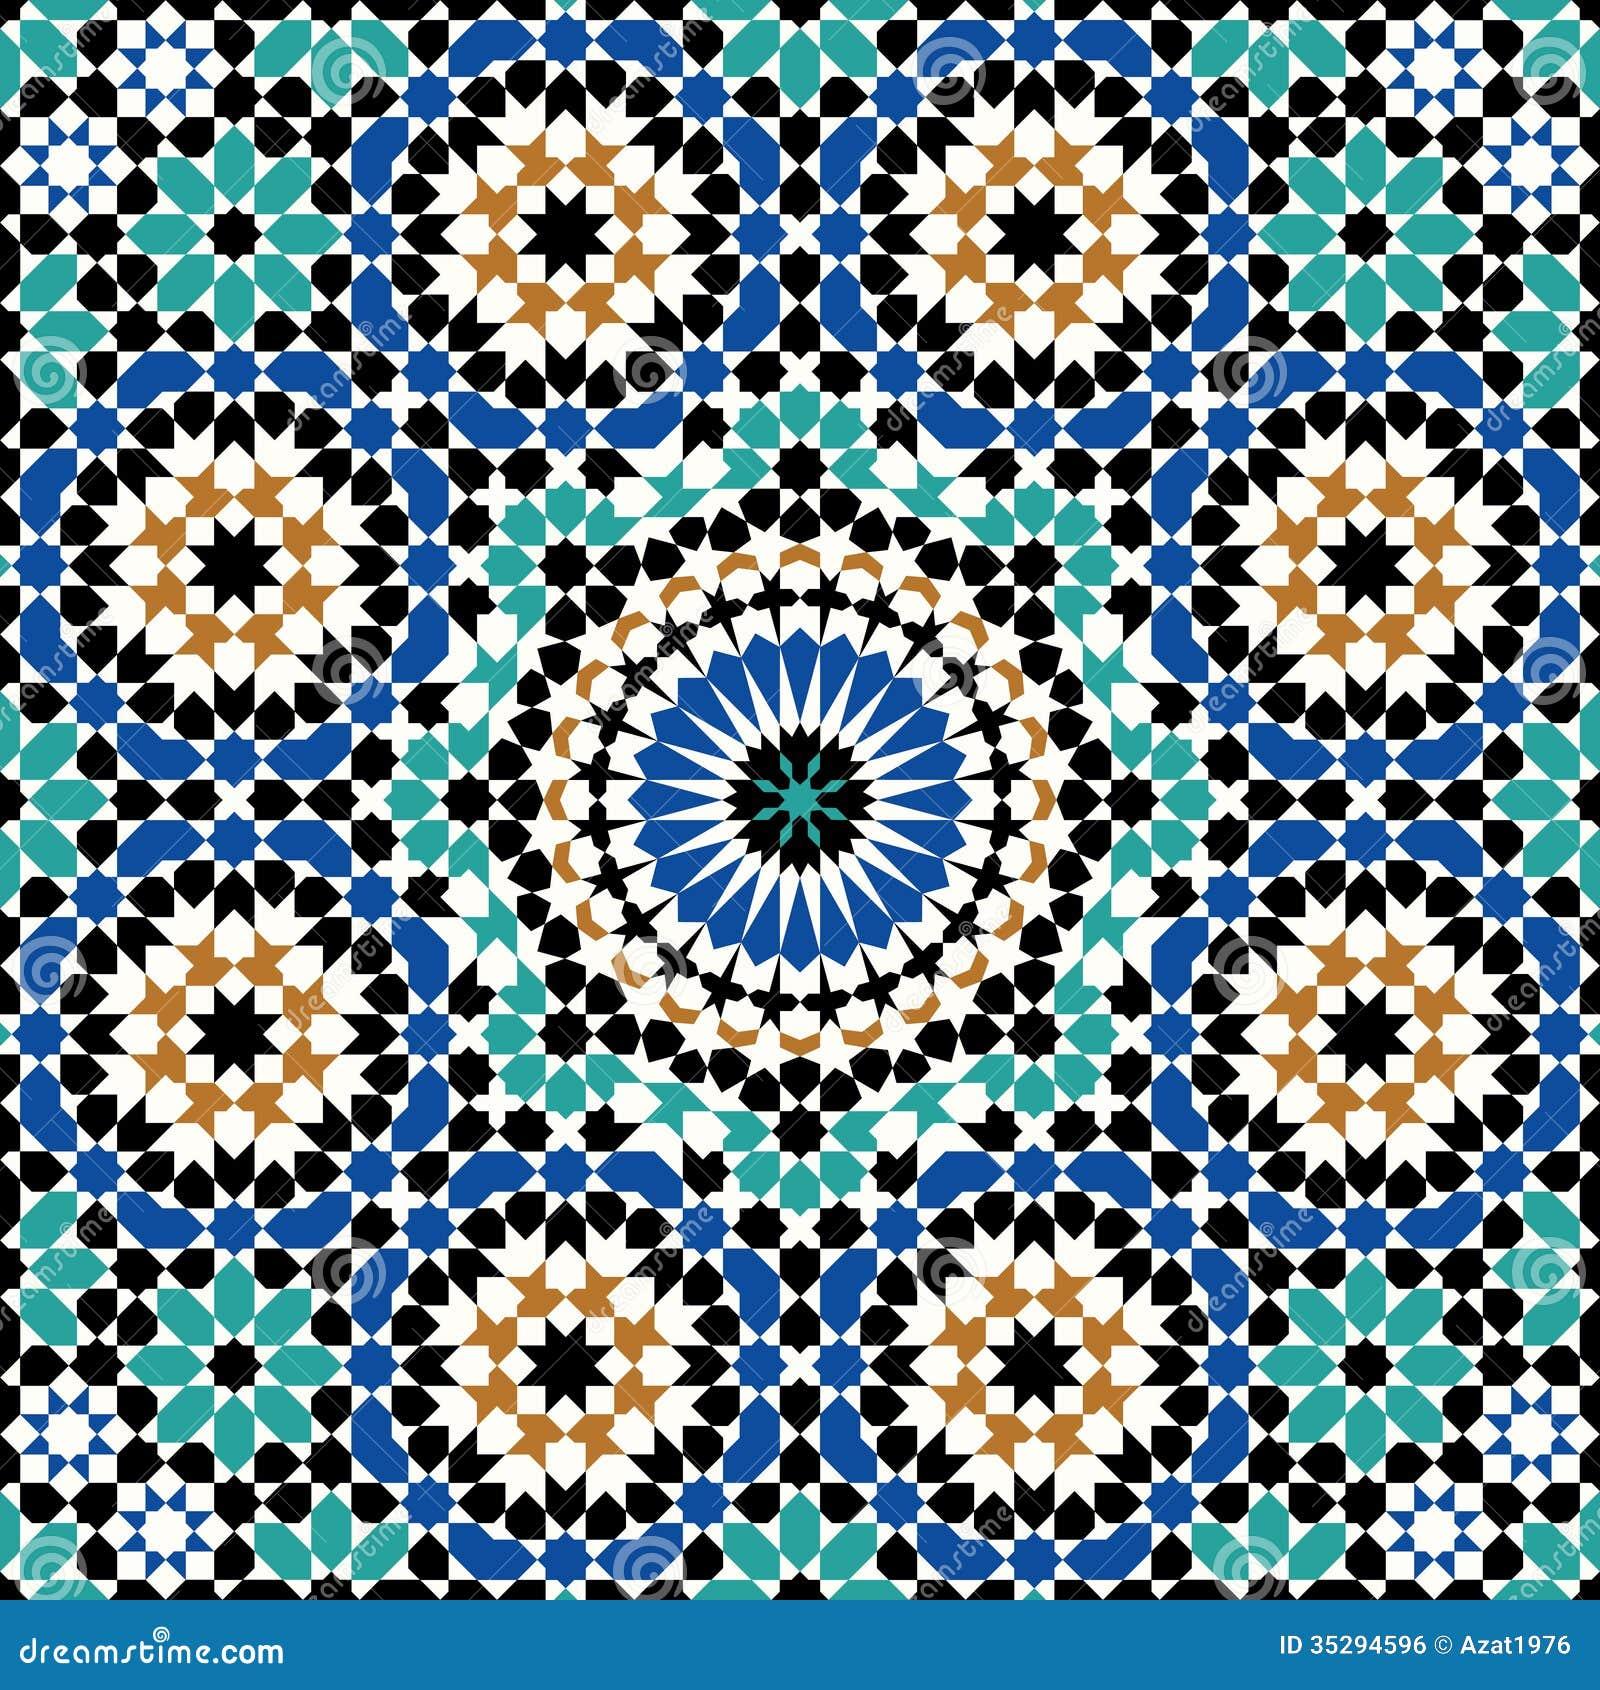 Displaying 20> Images For - Moorish Design Patterns...